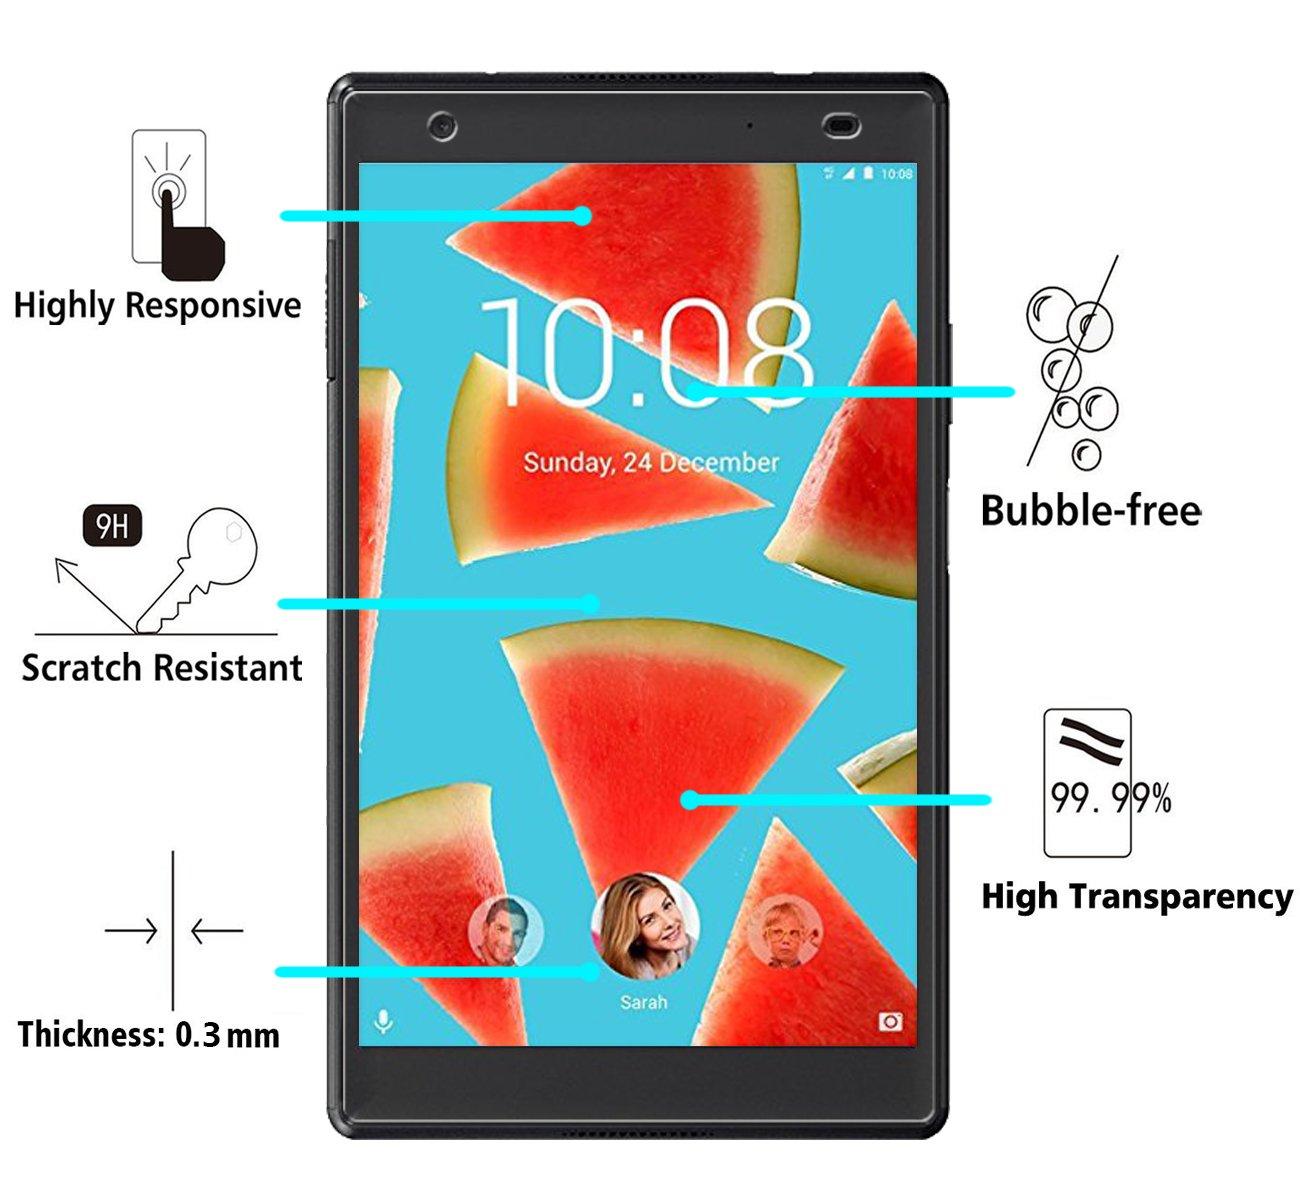 iVoler Protector de Pantalla para Lenovo TAB4 8 Plus/Lenovo Tab 4 8 Plus, Cristal Vidrio Templado Premium: Amazon.es: Electrónica